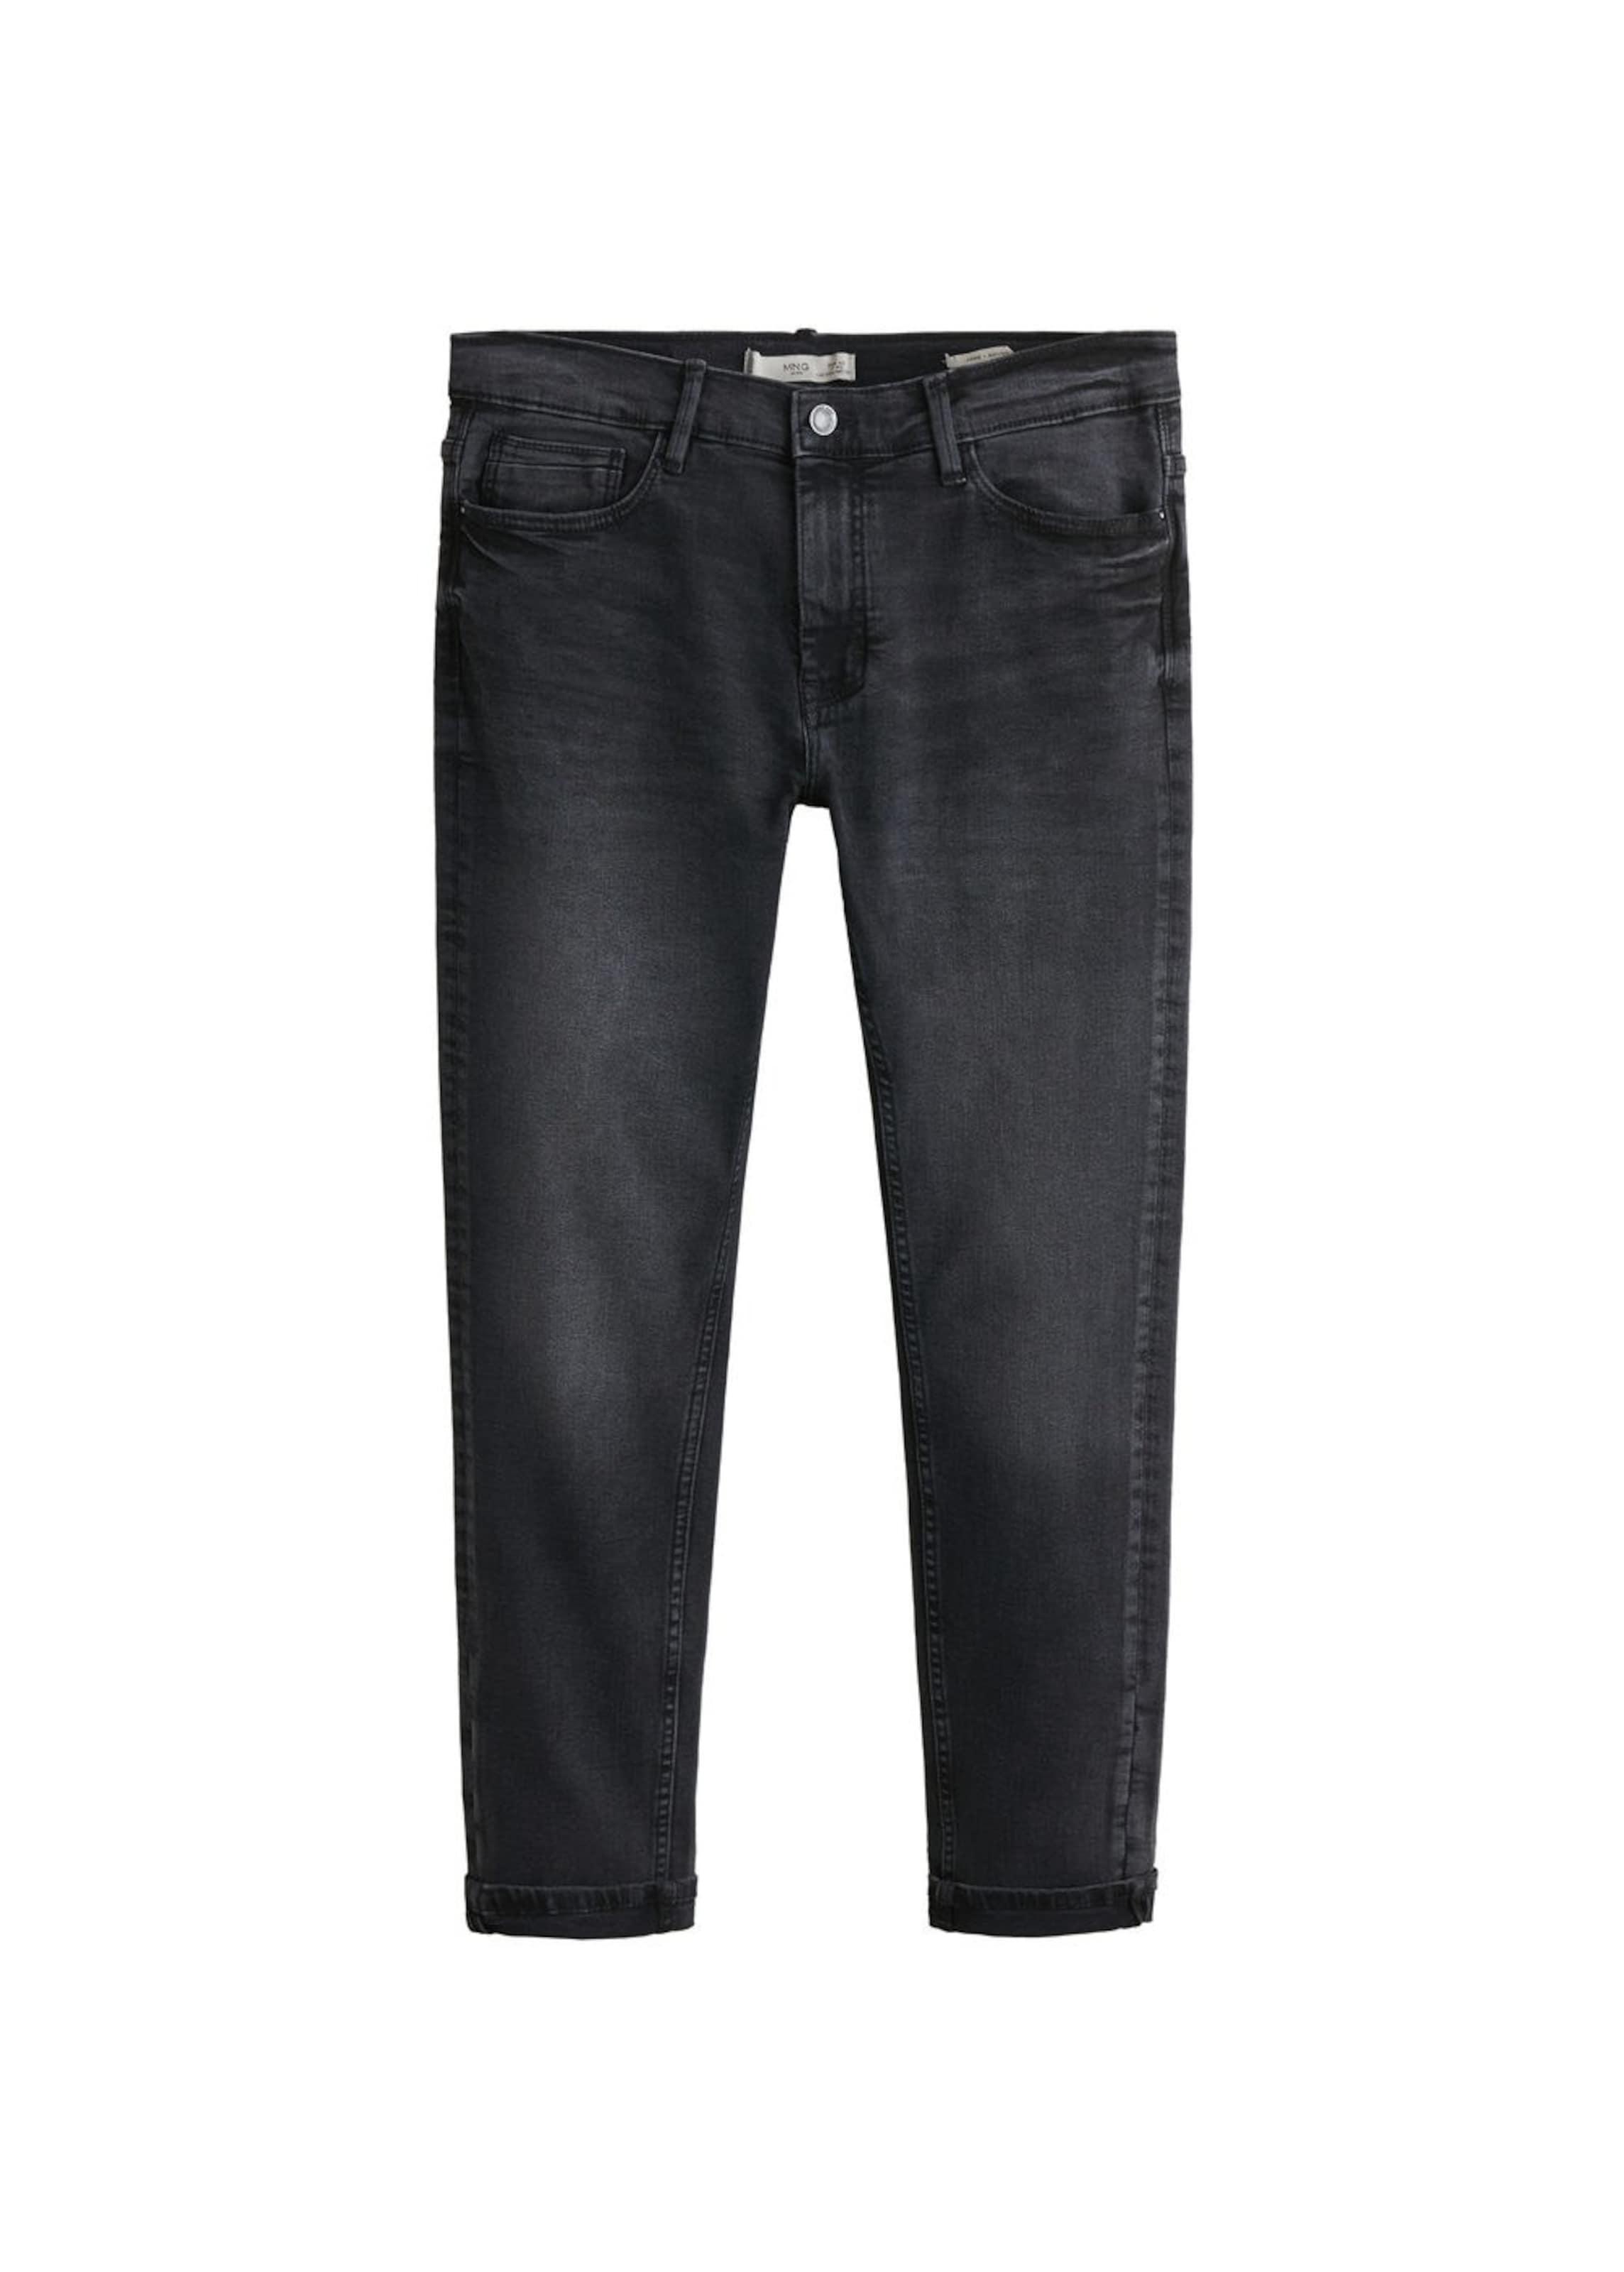 Mango Grey Denim Jeans 'jude5' Man In qUVpSMz